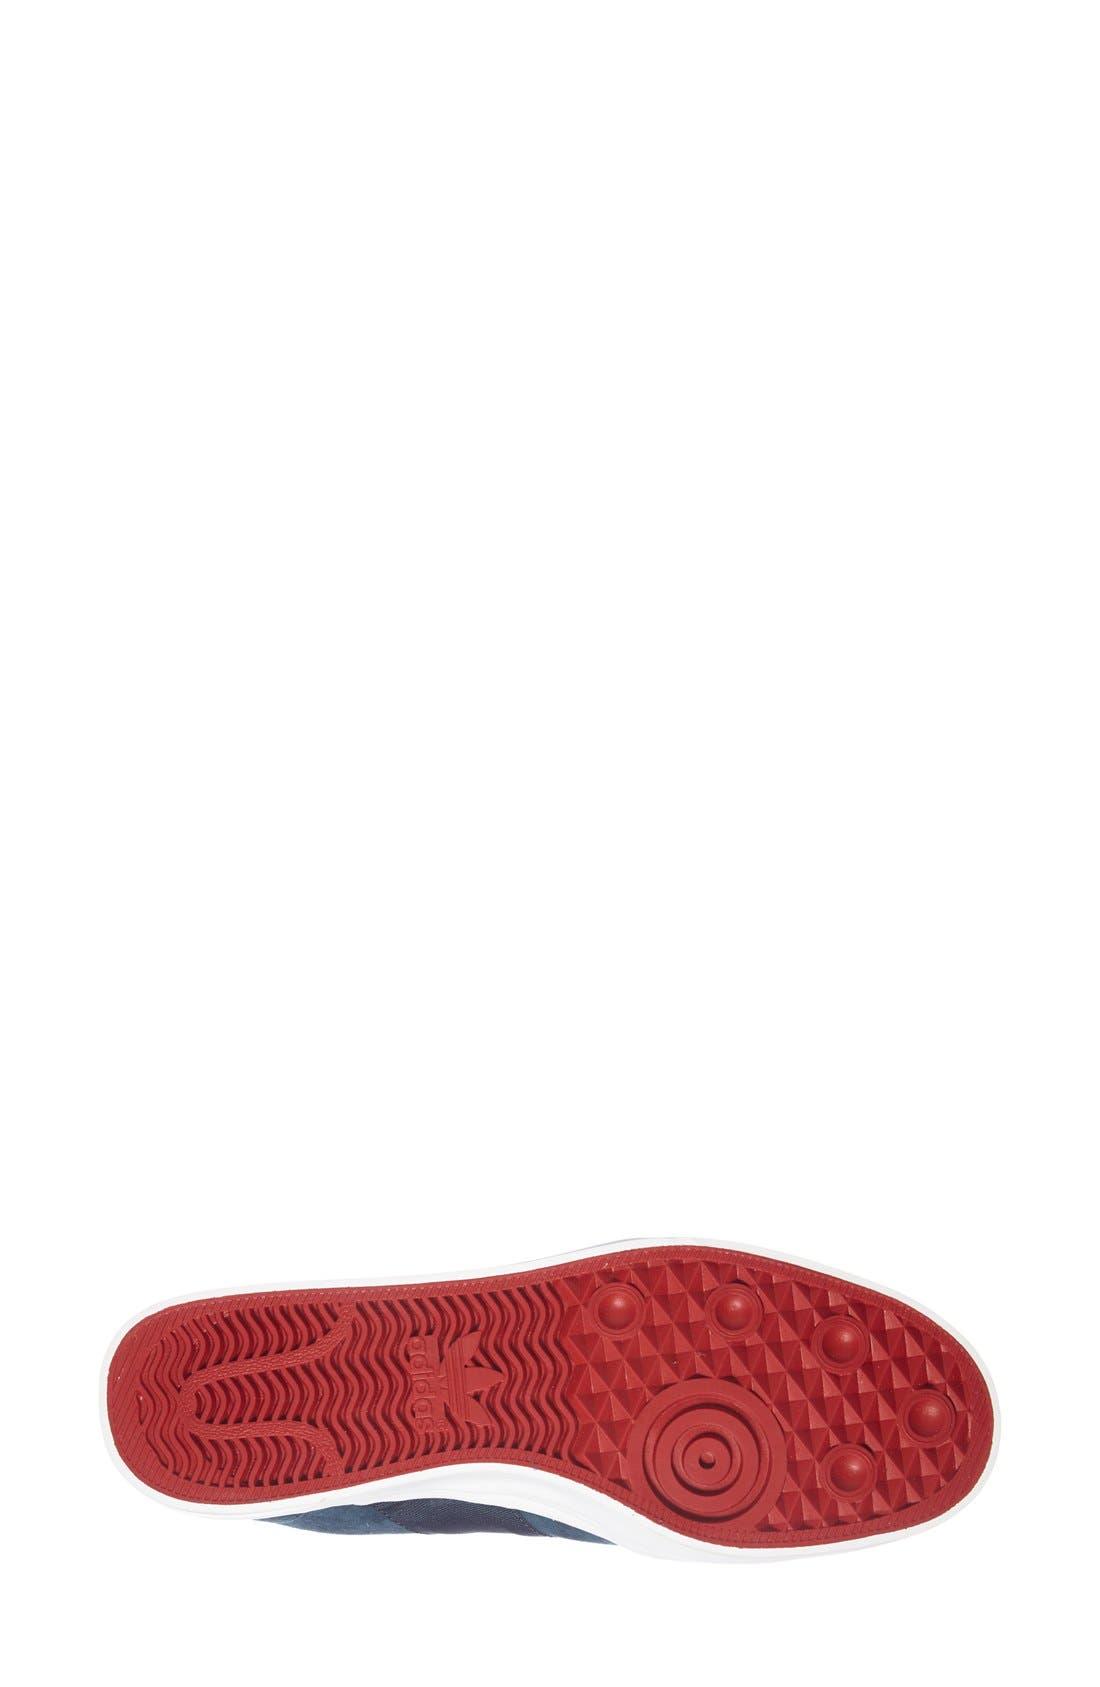 'Leo' High Top Sneaker,                             Alternate thumbnail 3, color,                             200